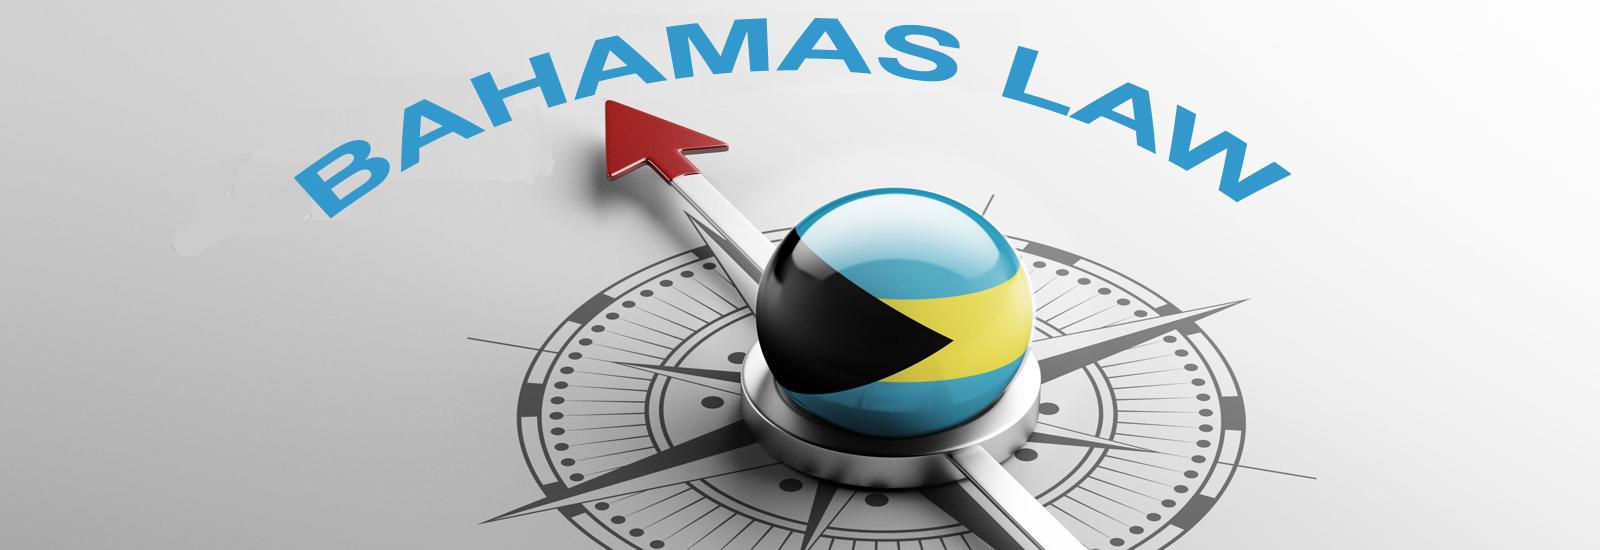 Bahamas High Resolution Coaching Concept